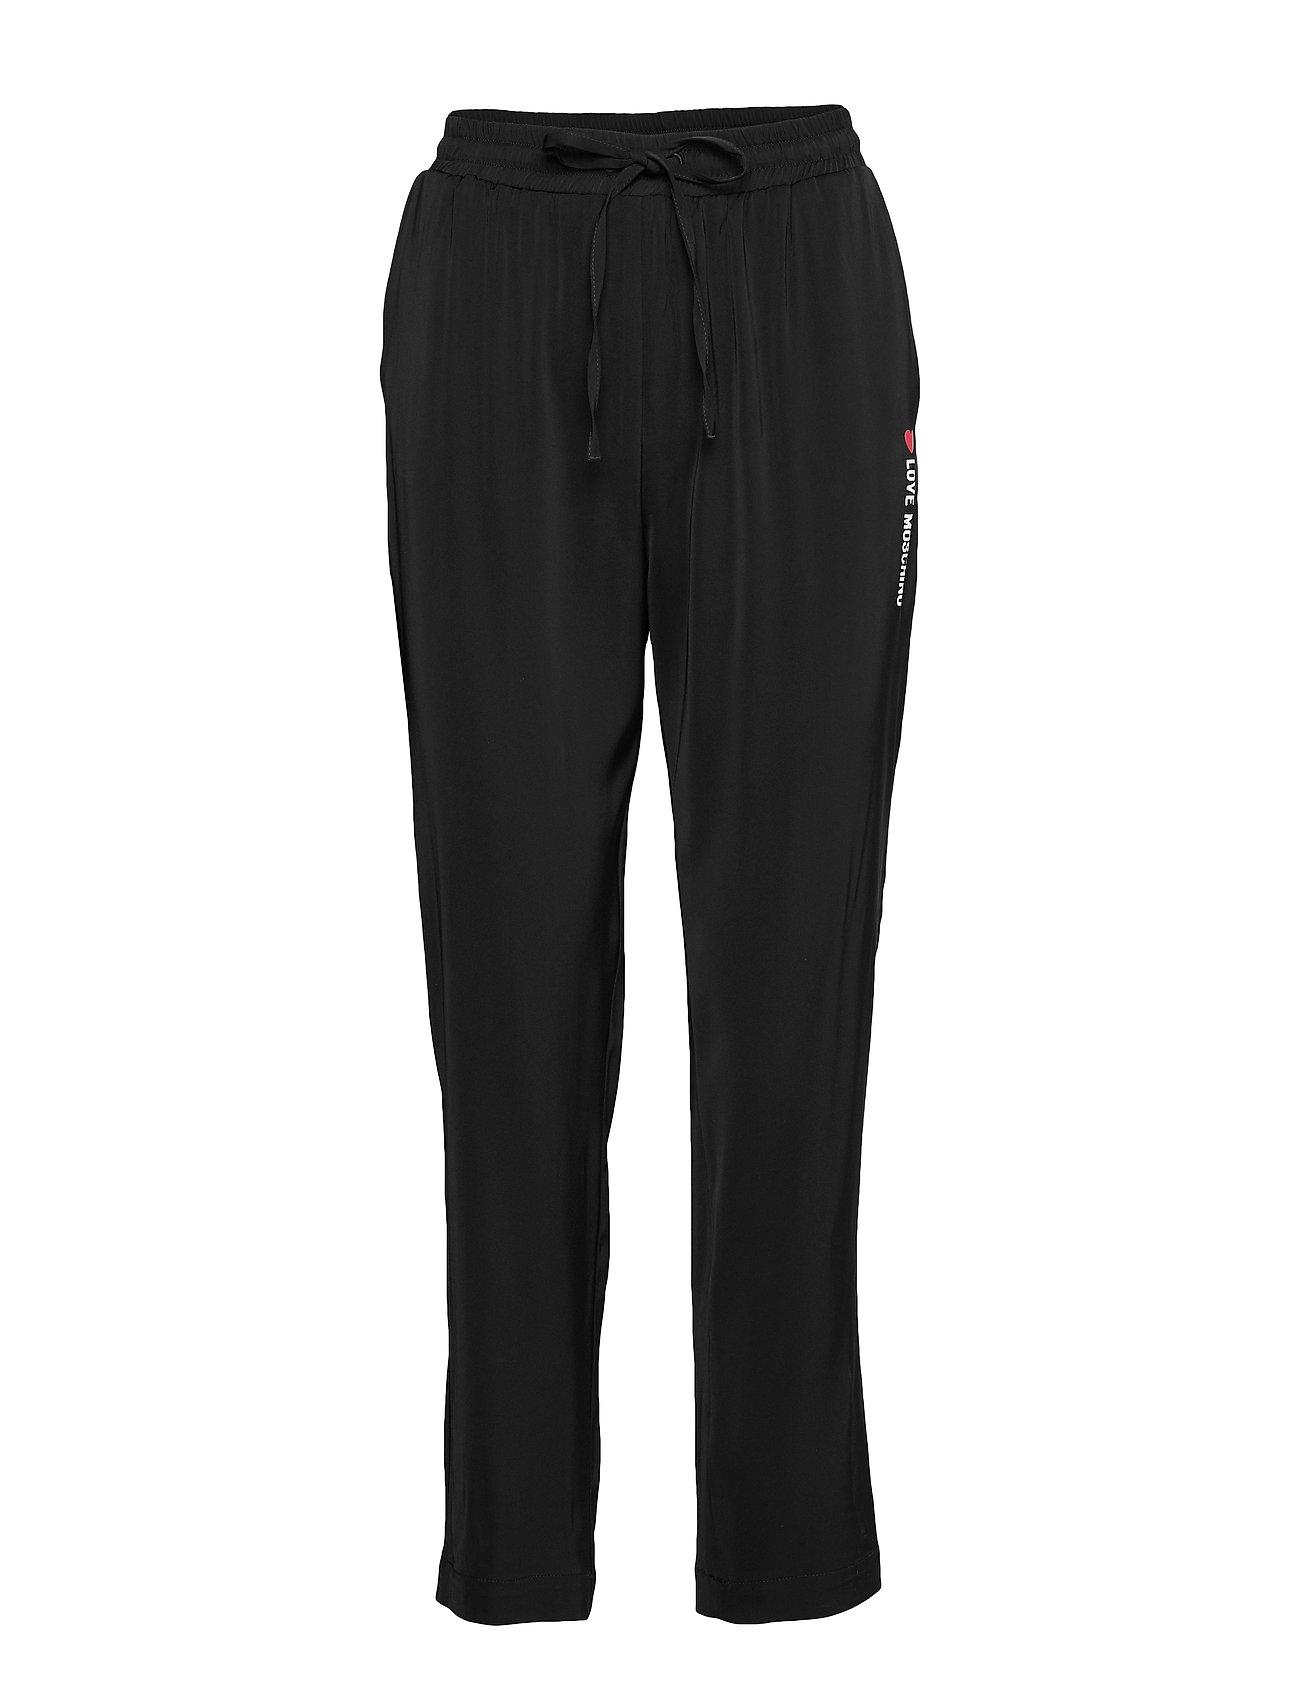 Image of Love Moschino Trousers Bukser Med Lige Ben Sort Love Moschino (3309076823)